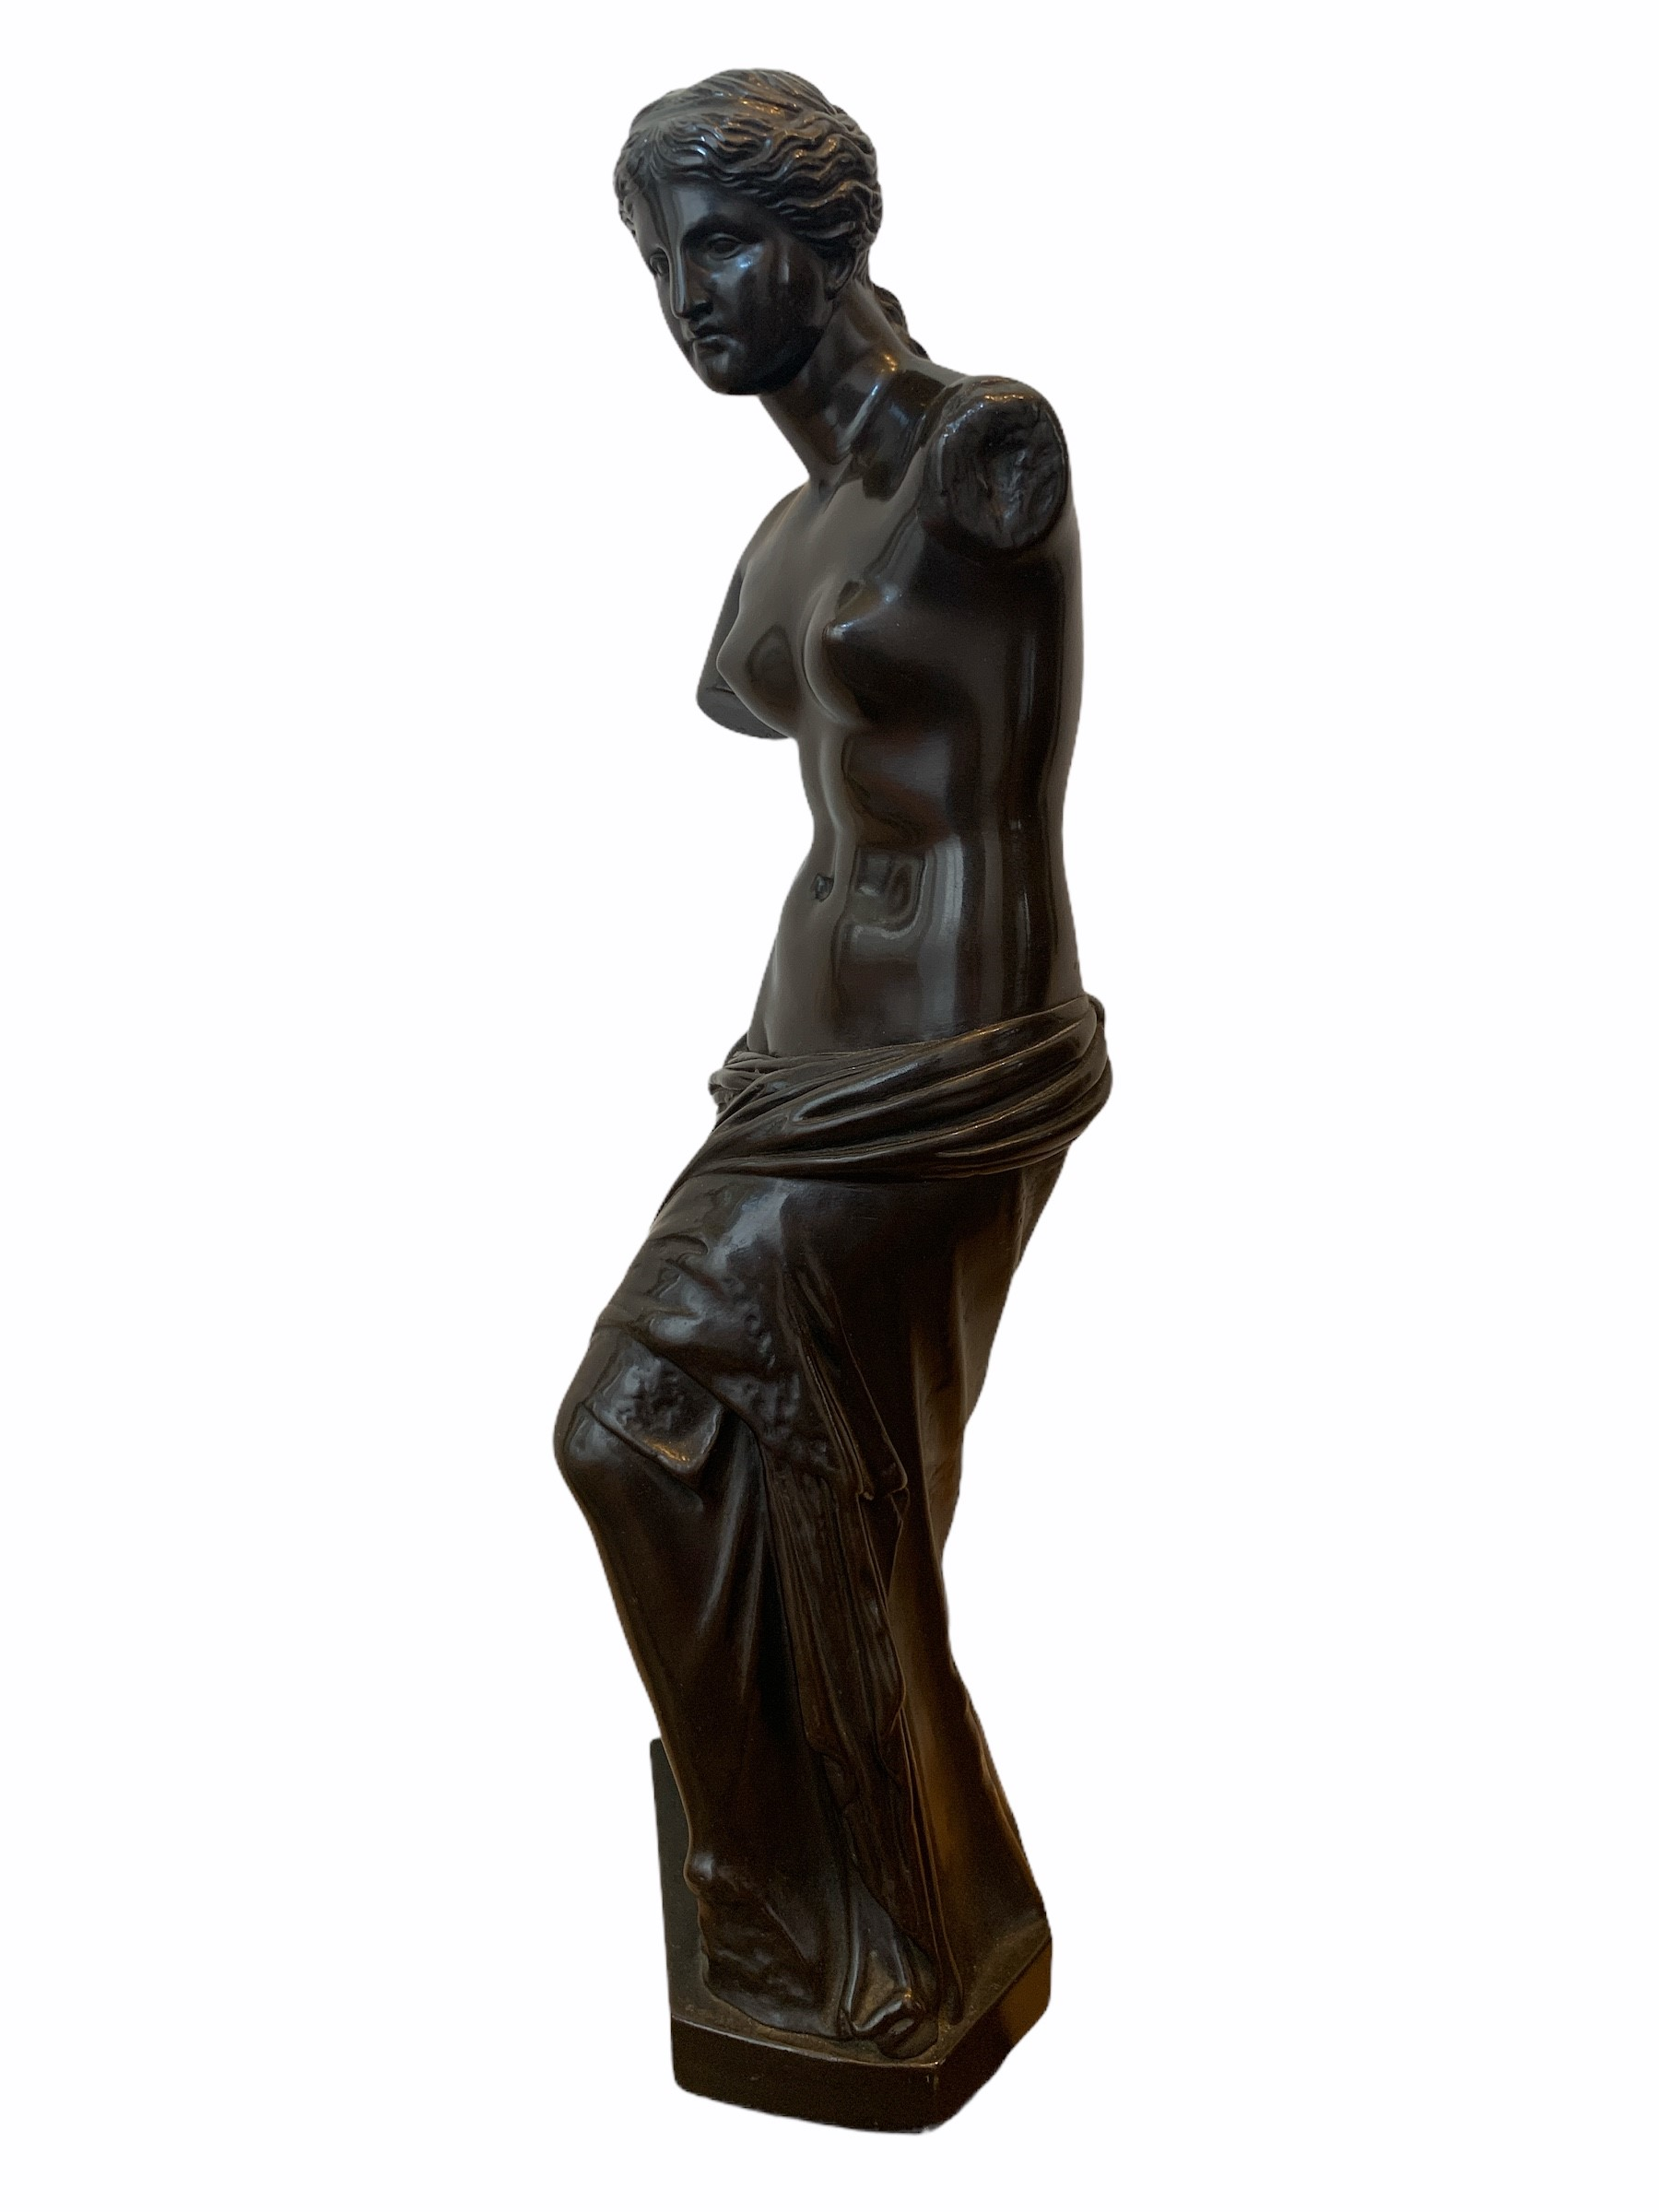 A 19TH CENTURY BRONZE CLAD STATUE OF A NEOCLASSICAL SEMINUDE FEMALE. (h 48cm x d 10.5cm x w 13cm) - Image 2 of 4